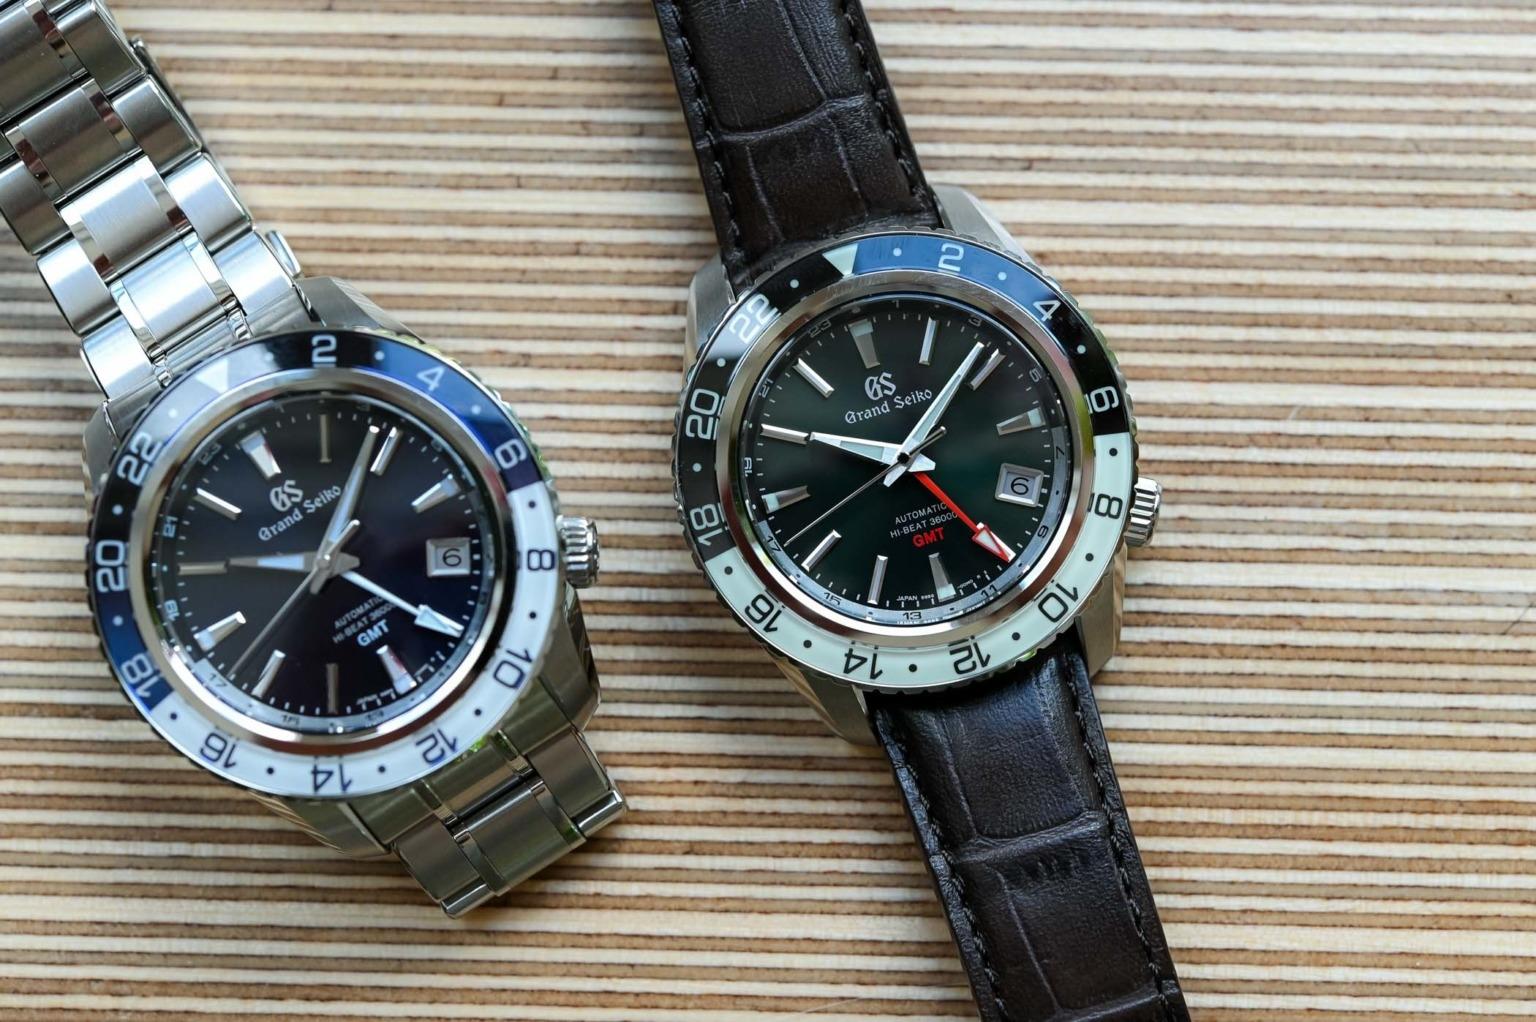 Grand-Seiko-Sport-GMT-Hi-Beat-SBGJ239-SBGJ237-1-1536x1022.jpg